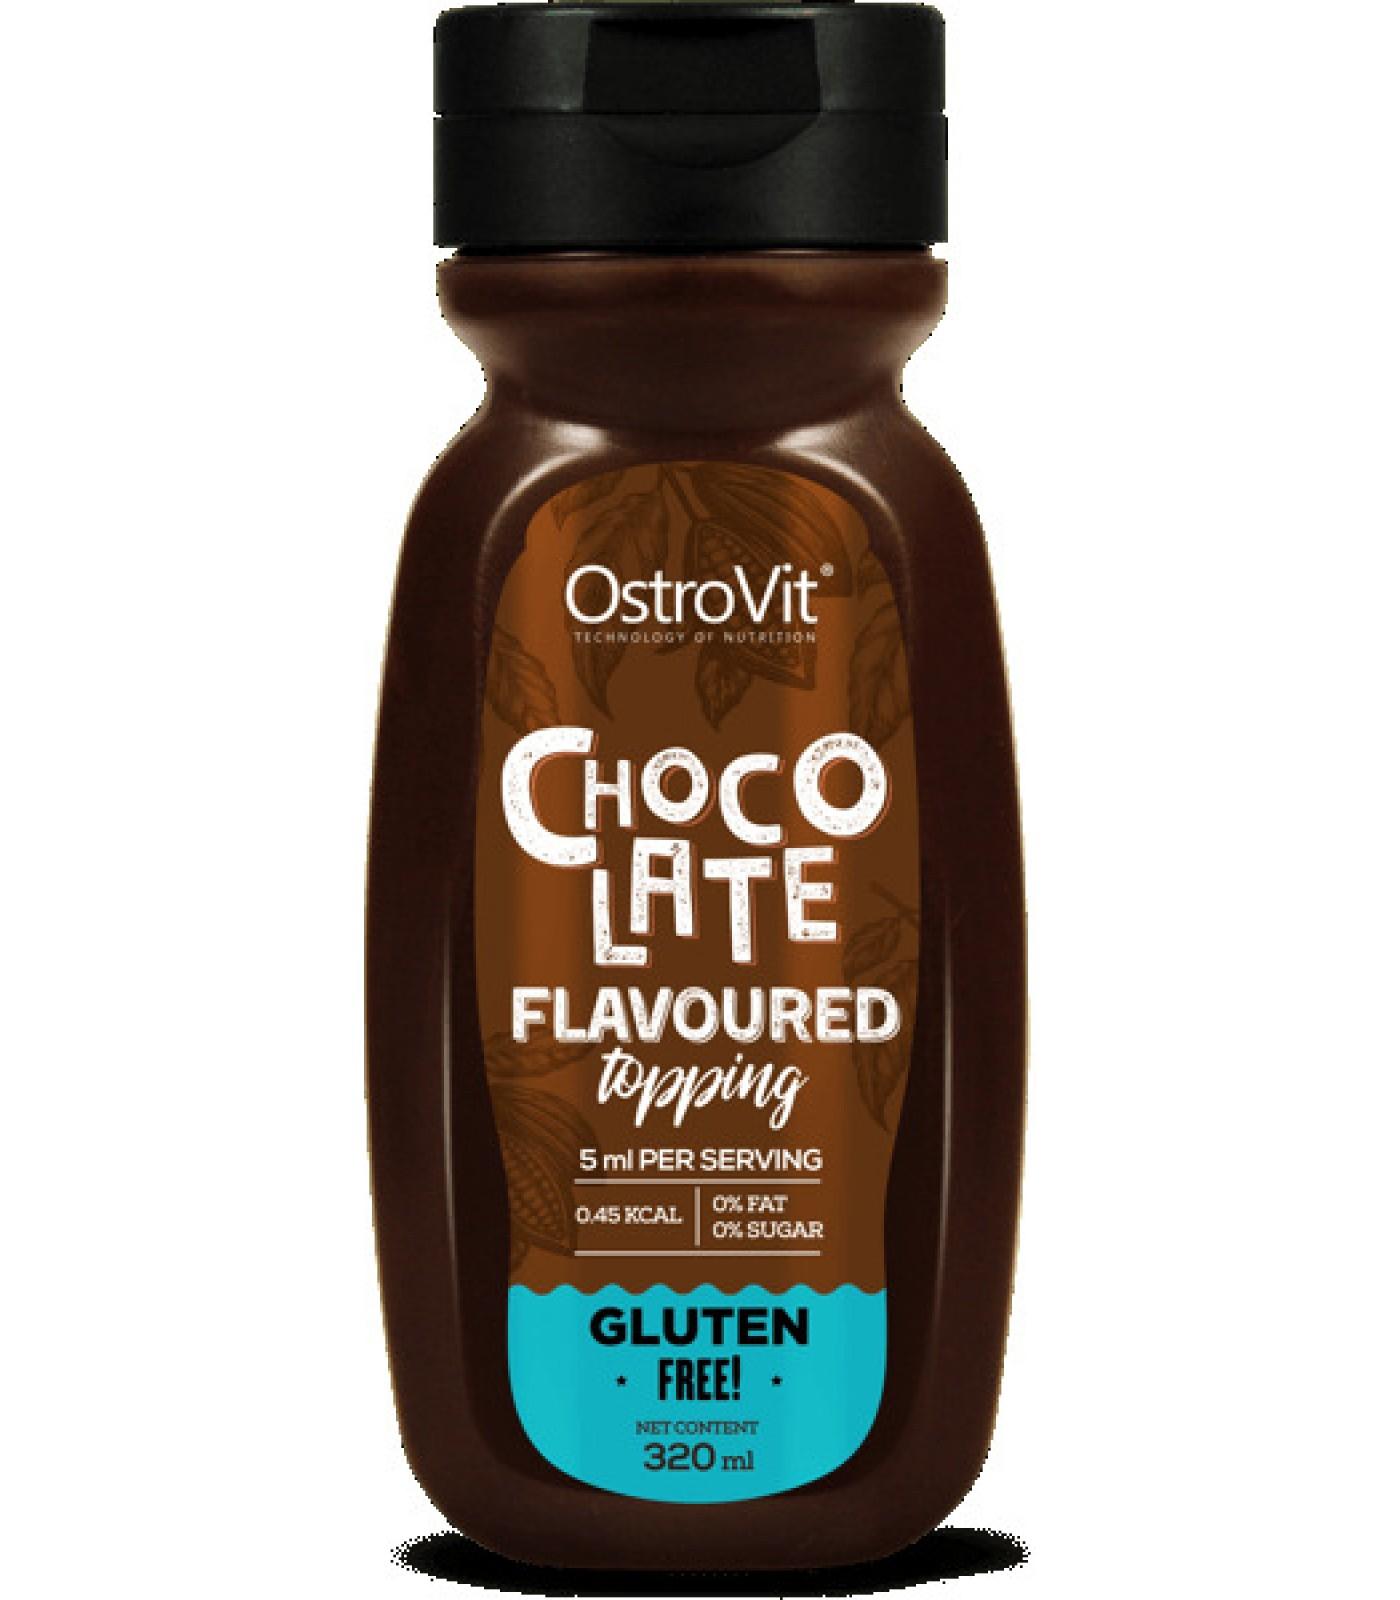 OstroVit - Chocolate Syrup / Zero Calorie / 320ml.